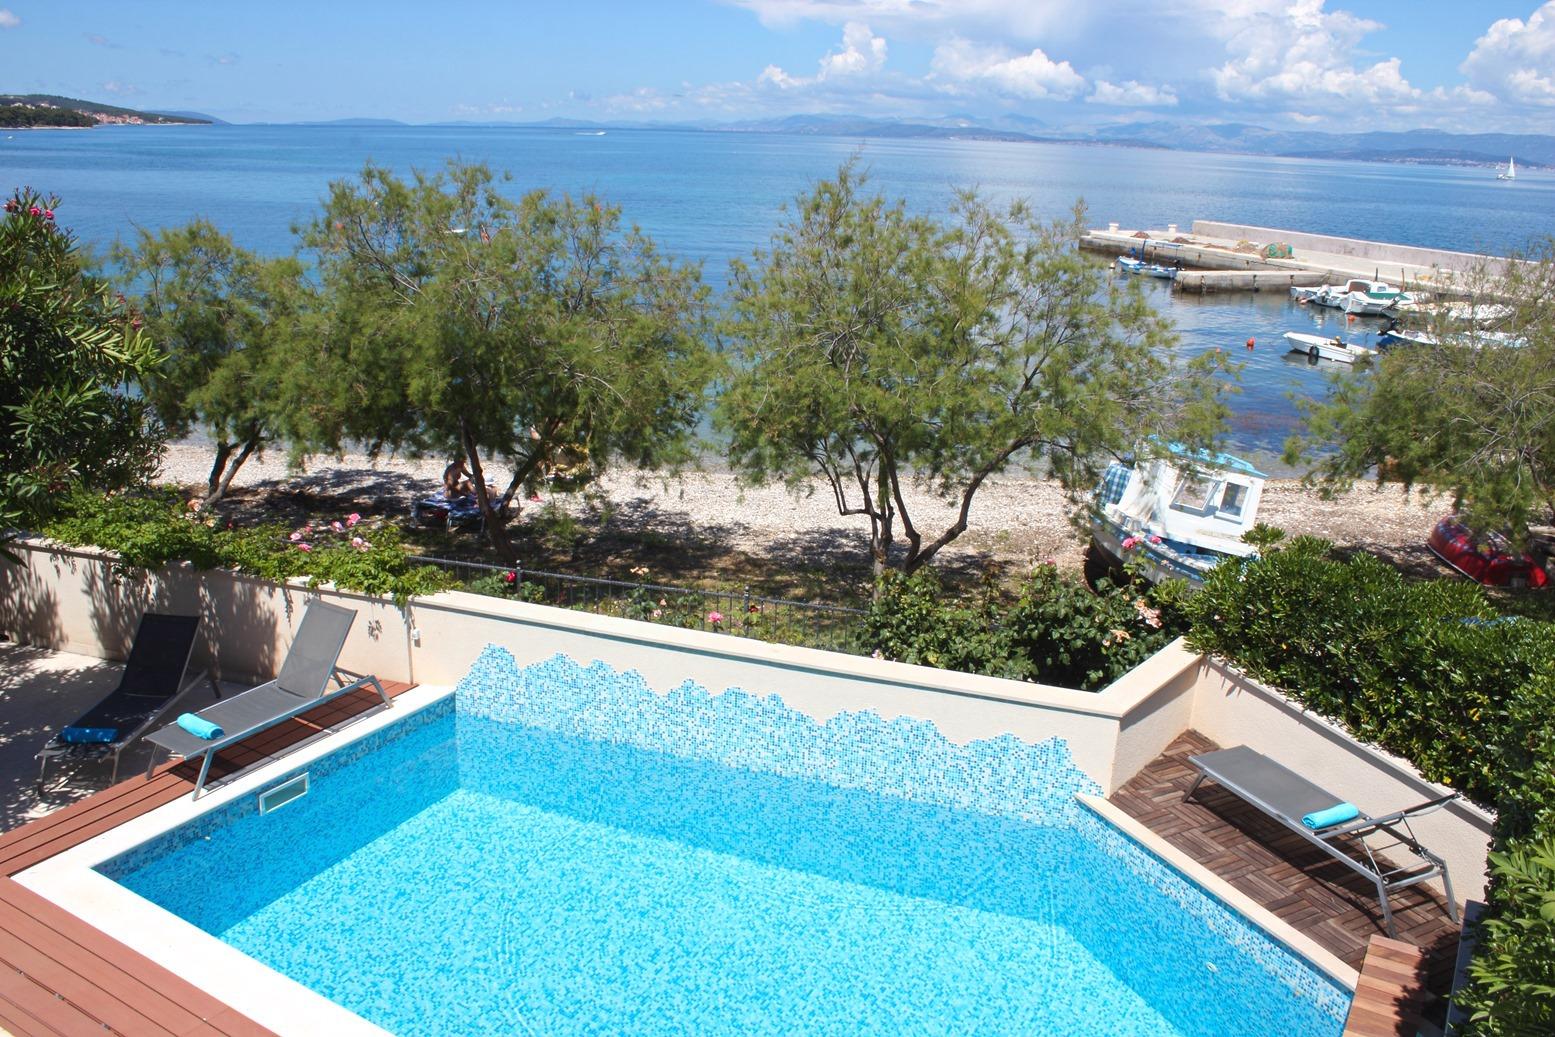 6018 - Mirca - Vakantiehuizen, villa´s Kroatië